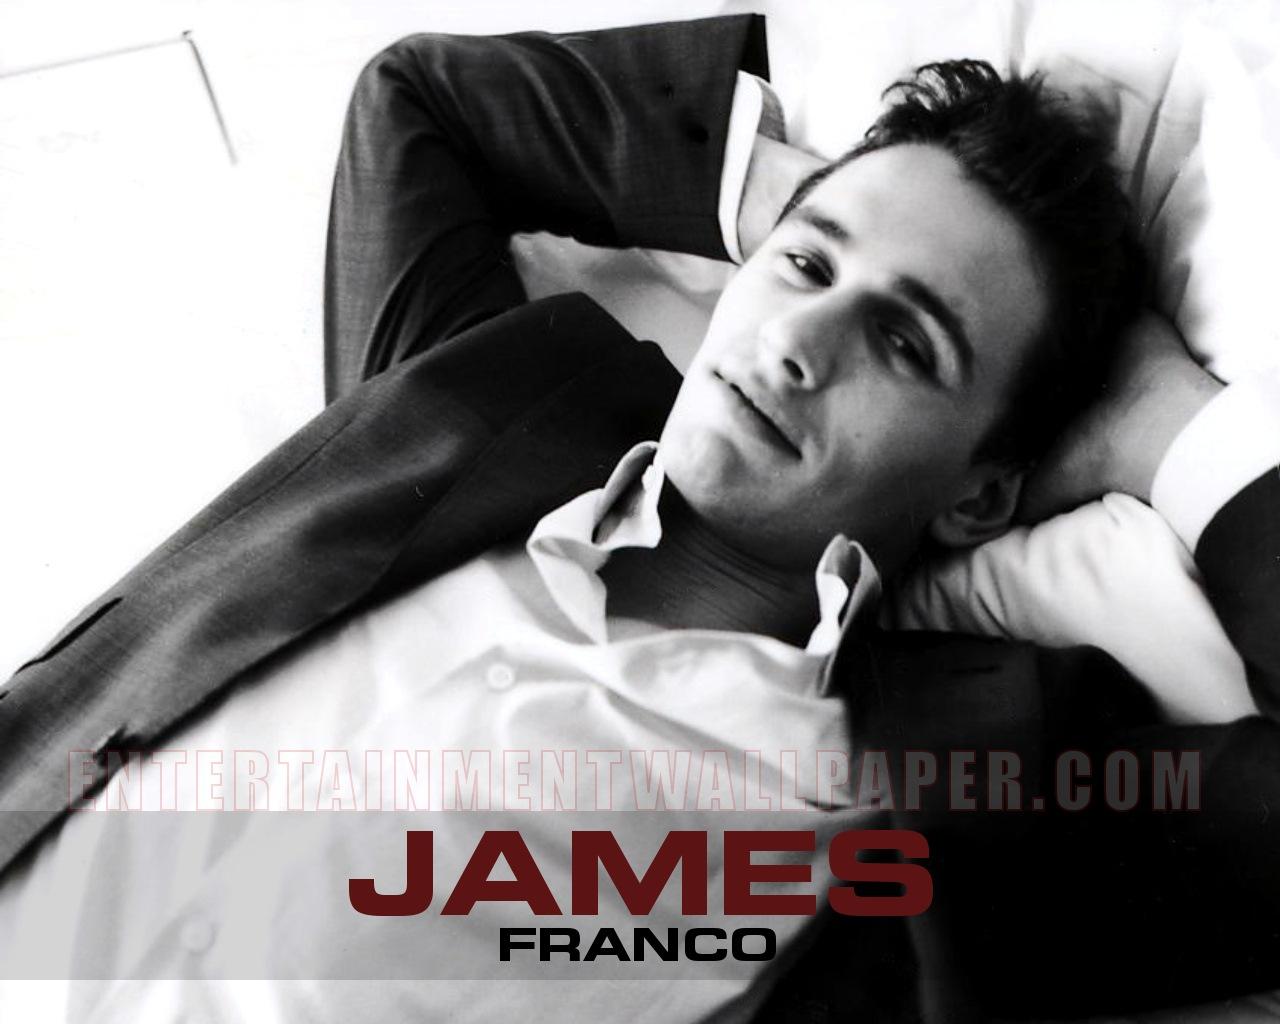 http://4.bp.blogspot.com/-3dz8MgYZGOg/T8Nj3P6CUeI/AAAAAAAACwg/5Kv6PEiu3_w/s1600/James+Franco+HD+Wallpapers+2012_1.jpg